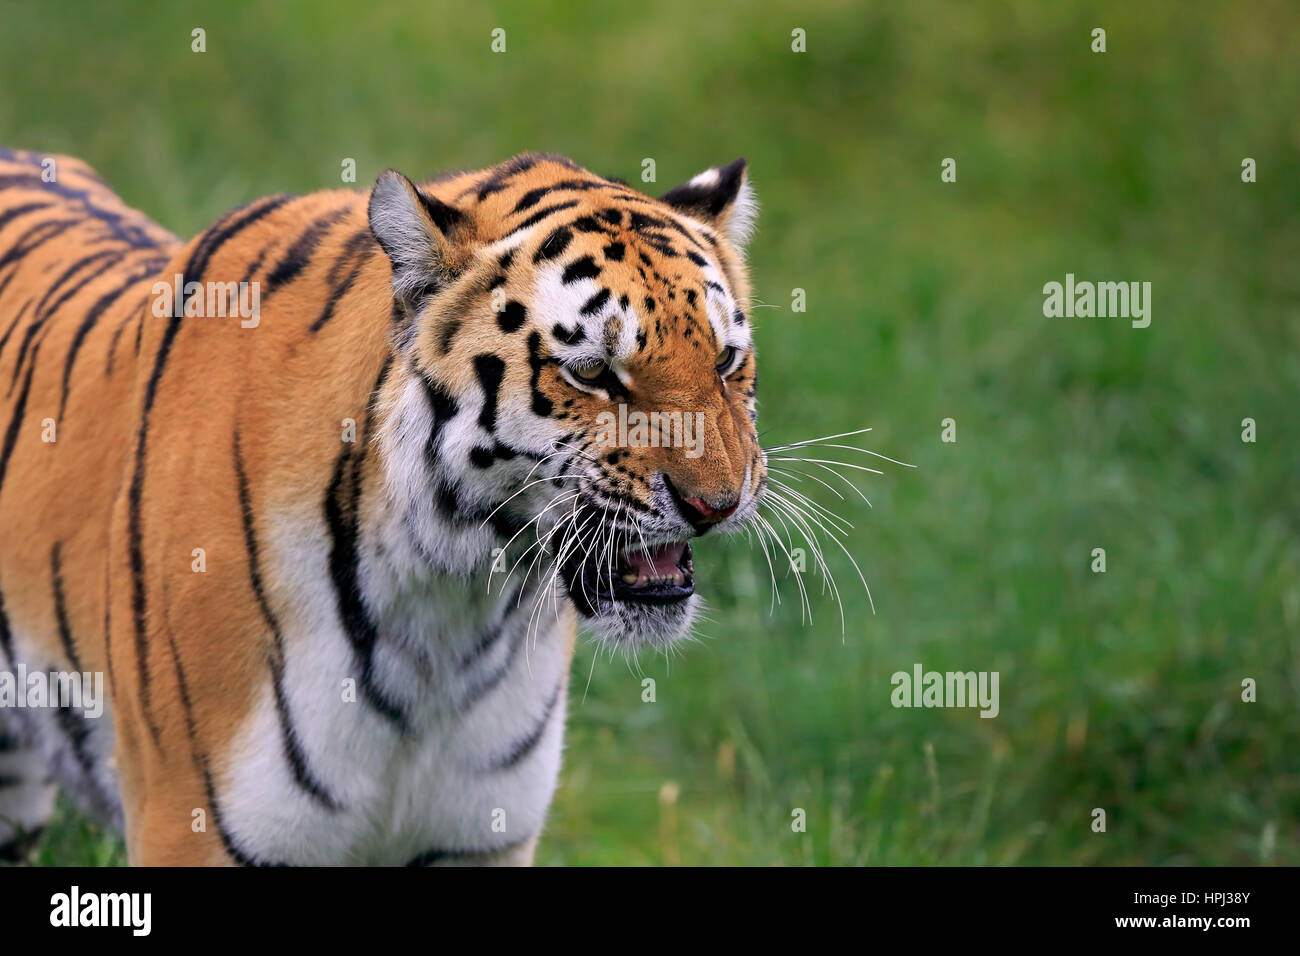 Siberian Tiger, (Panthera tigris altaica), adult snarling portrait, Asia - Stock Image